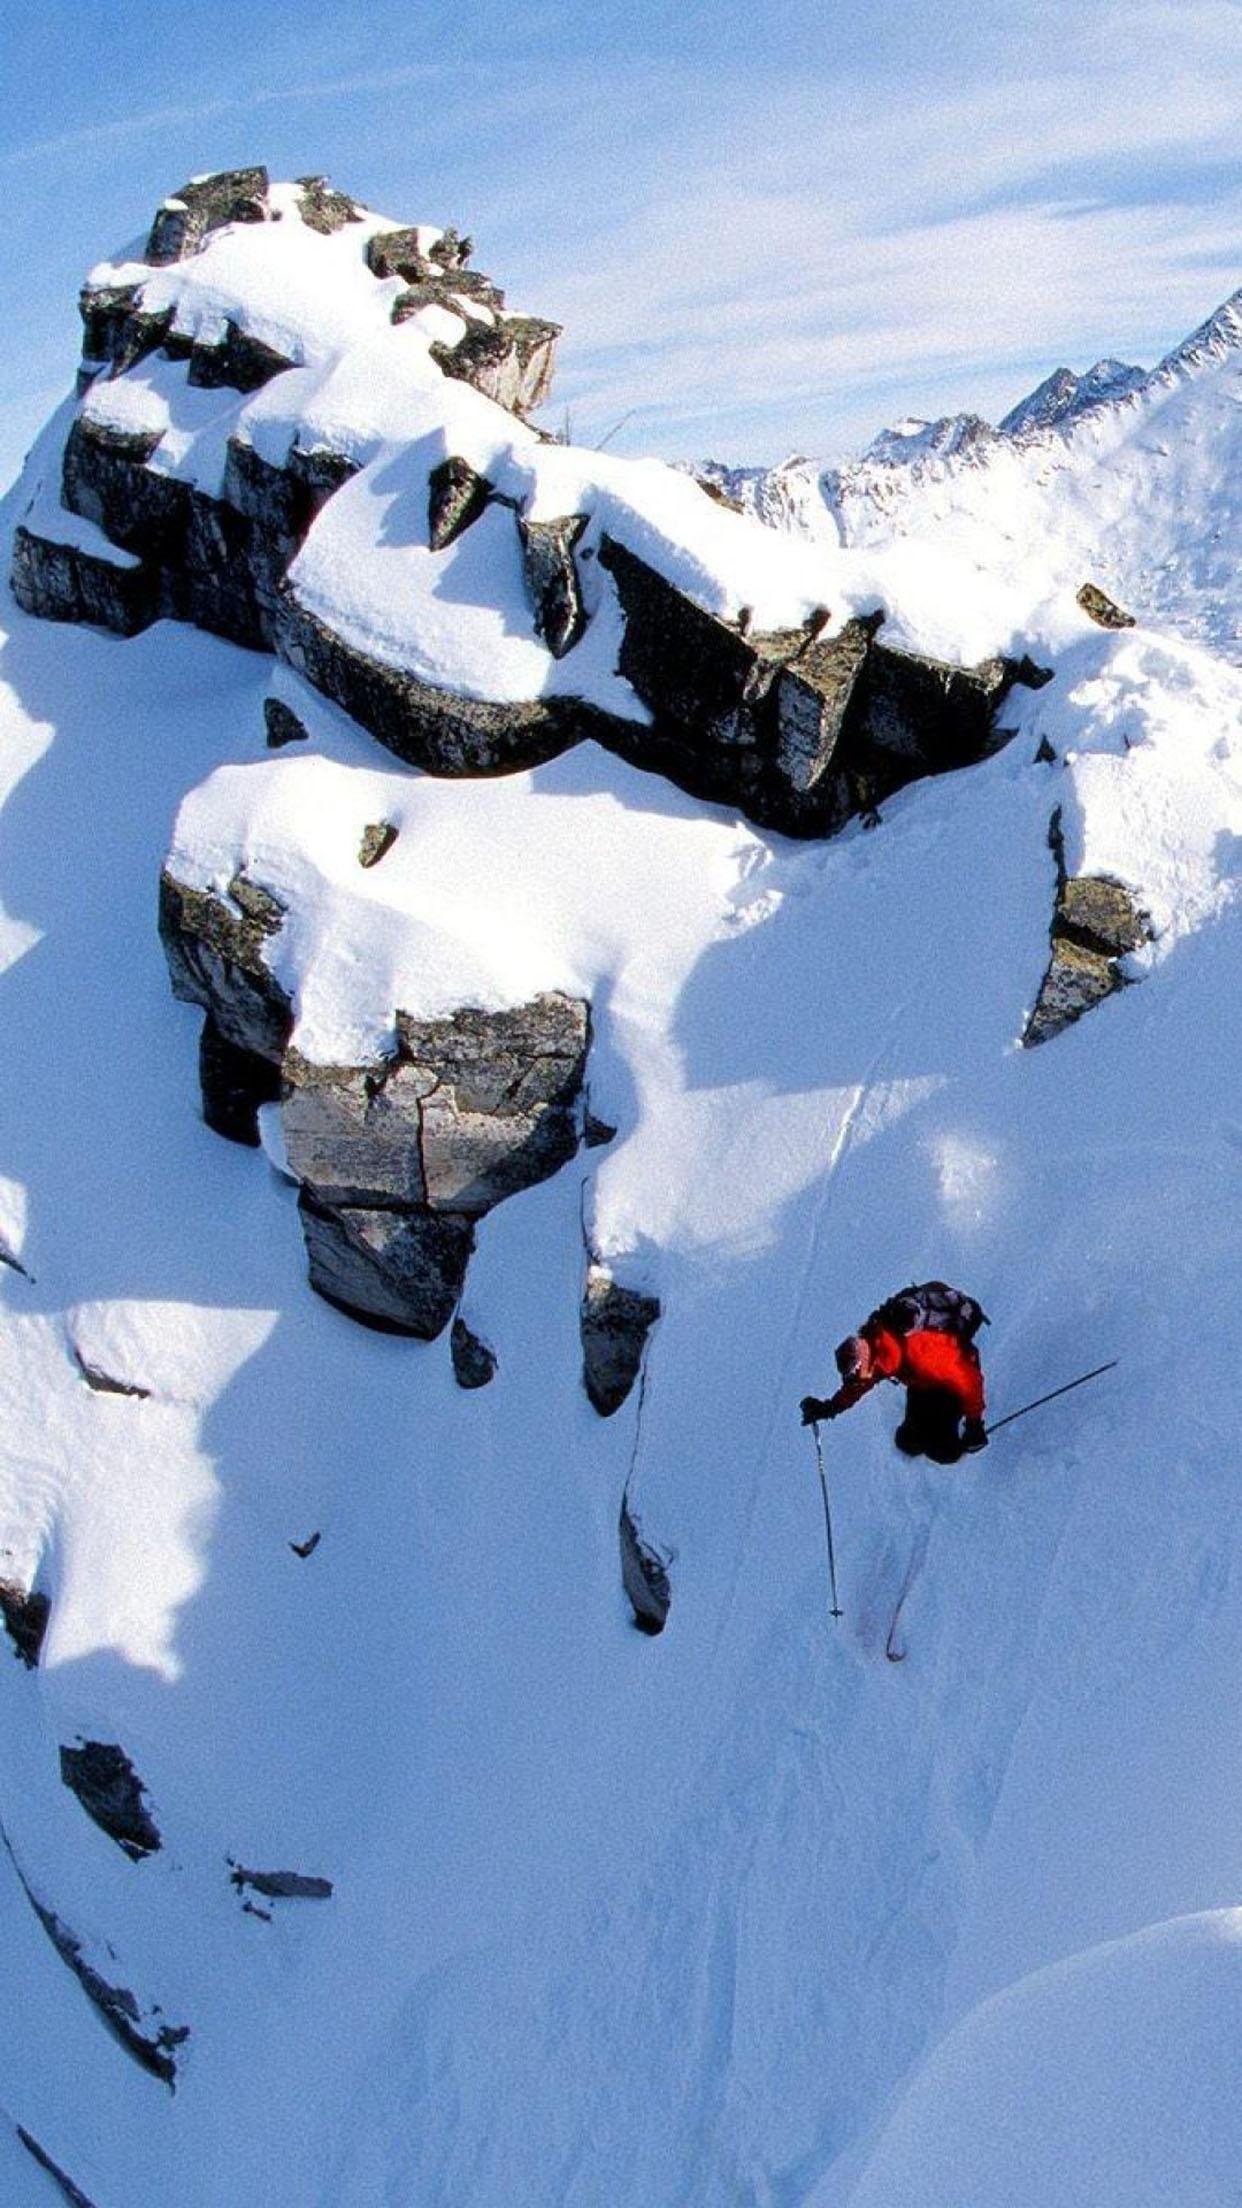 Ski Ski 2 3Wallpapers iPhone Parallax Ski 2